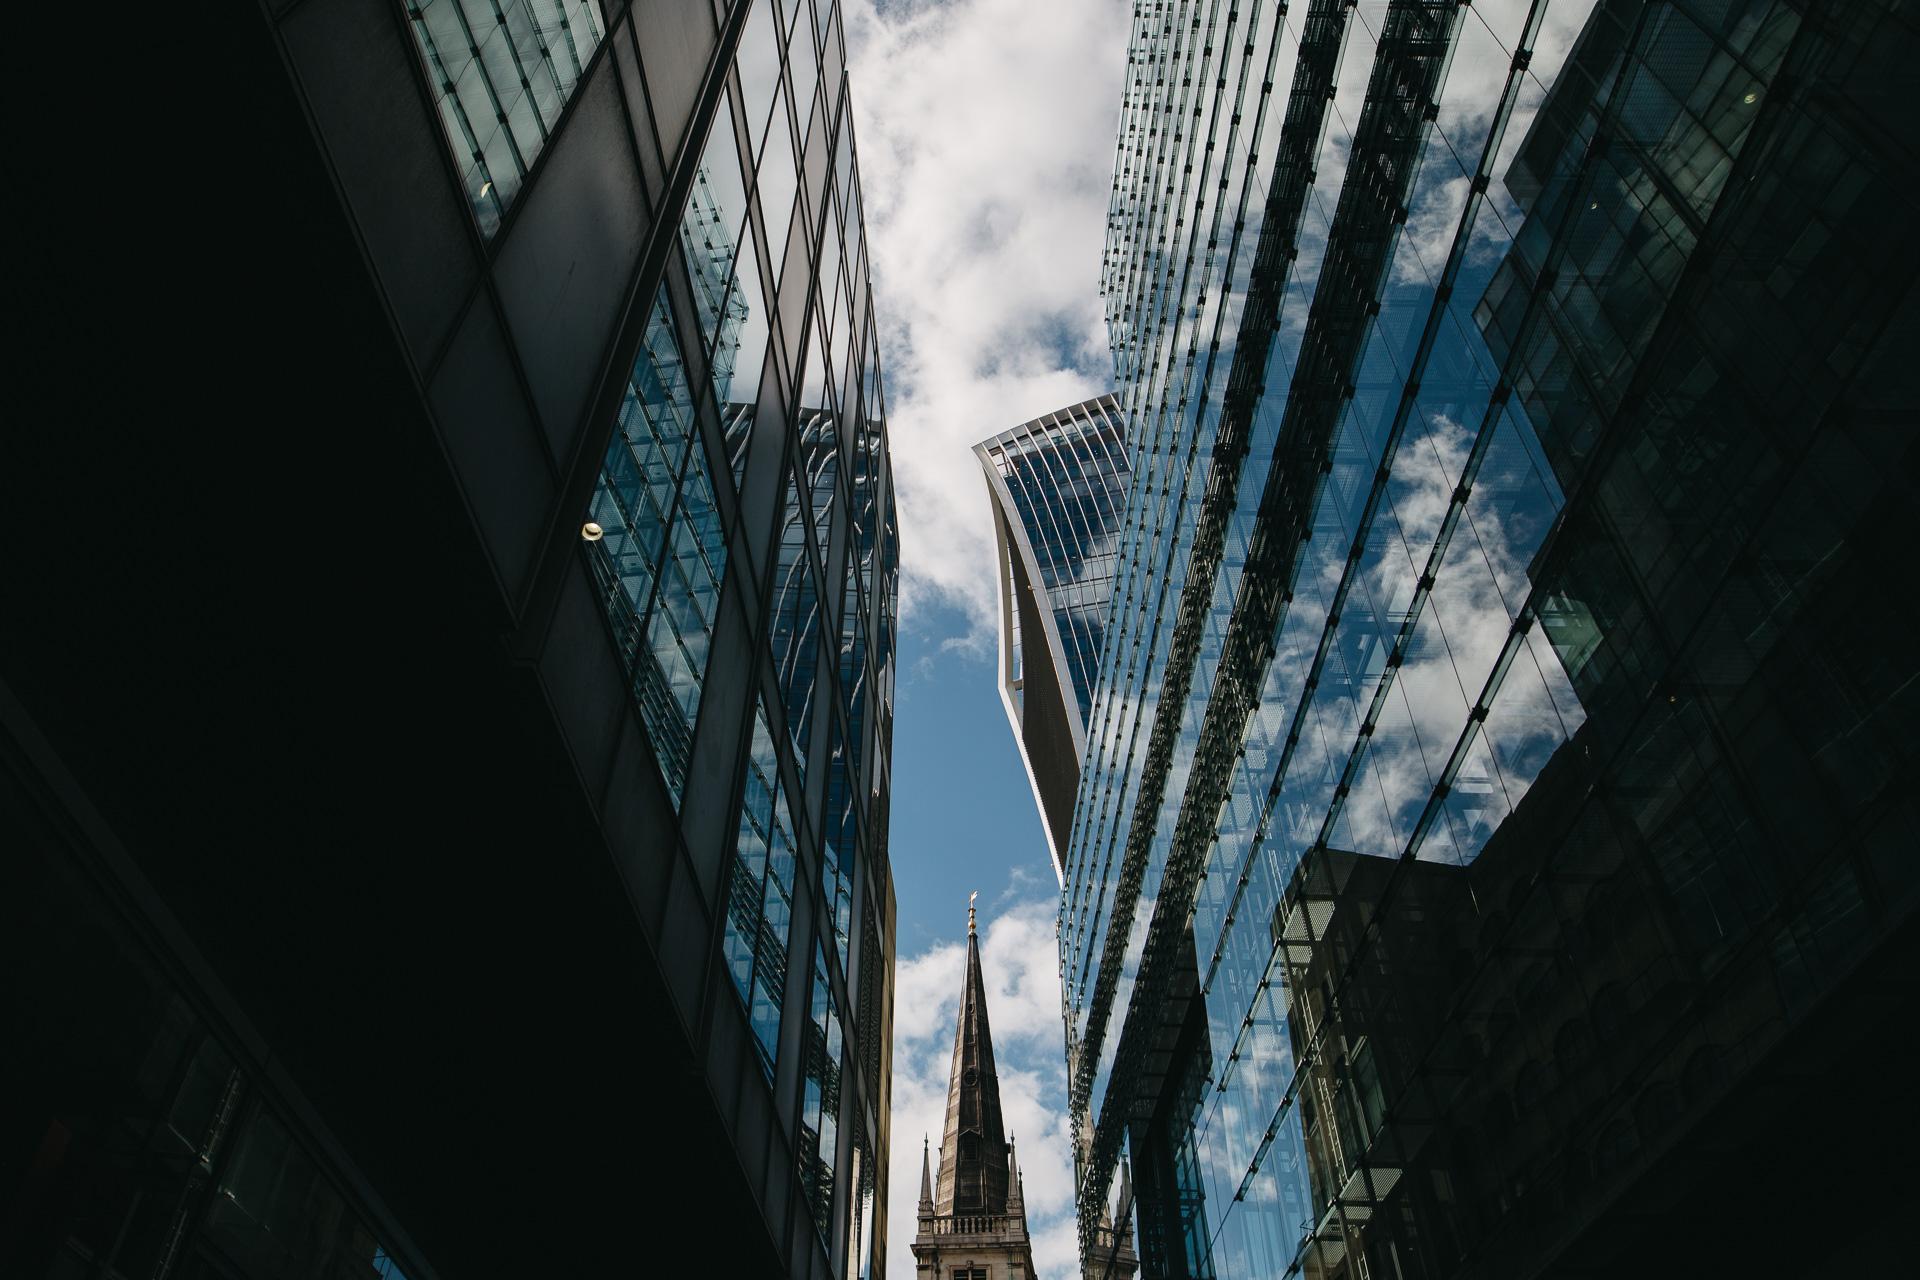 gabor_lenart_london_photographer_street_blogger_lifestyle_img_4989